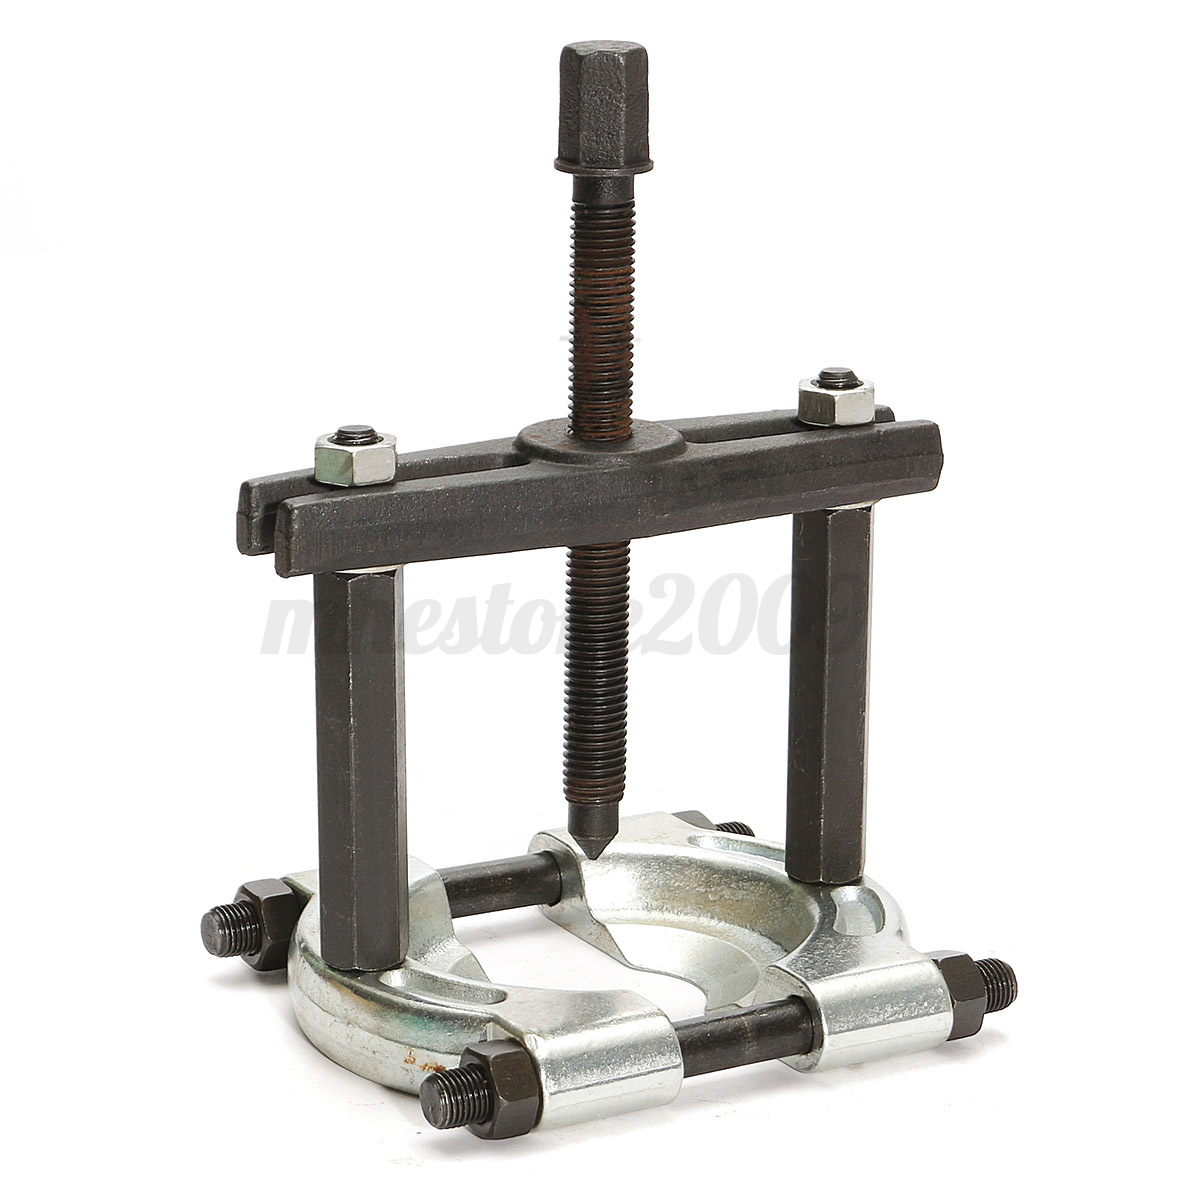 Bearing Splitter Gear Puller : Pcs bearing splitter gear puller fly wheel separator